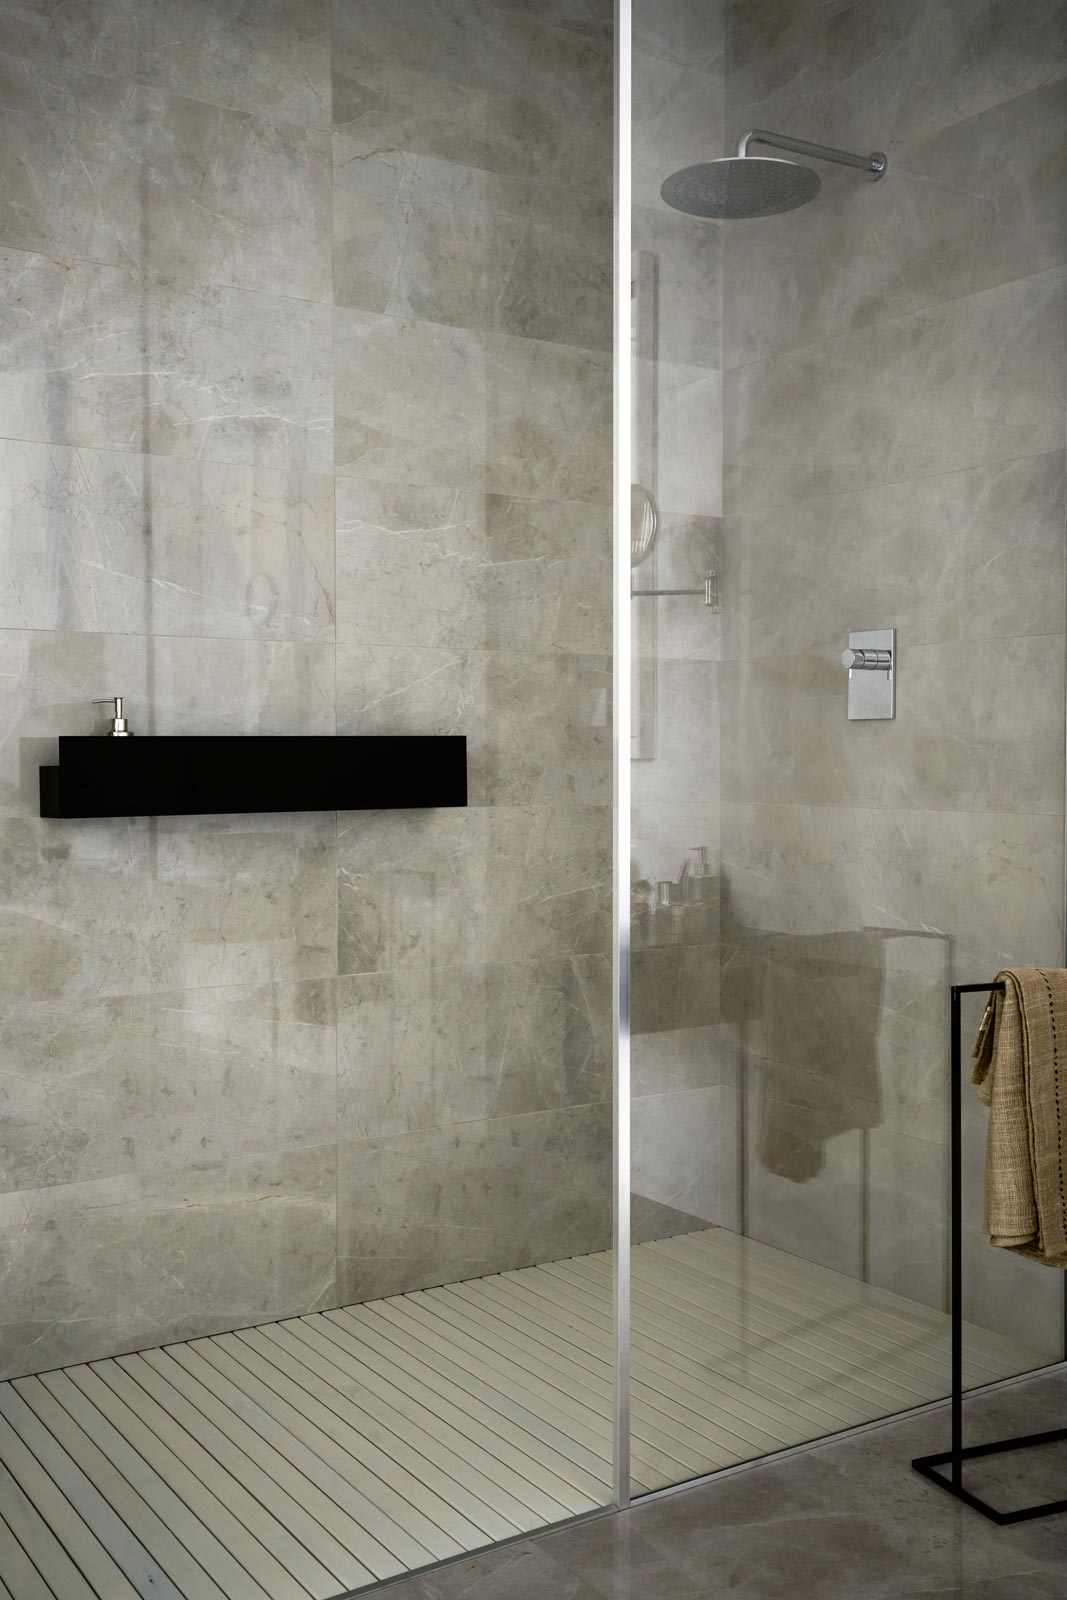 mosaik fliesen dusche pflege verschiedene. Black Bedroom Furniture Sets. Home Design Ideas